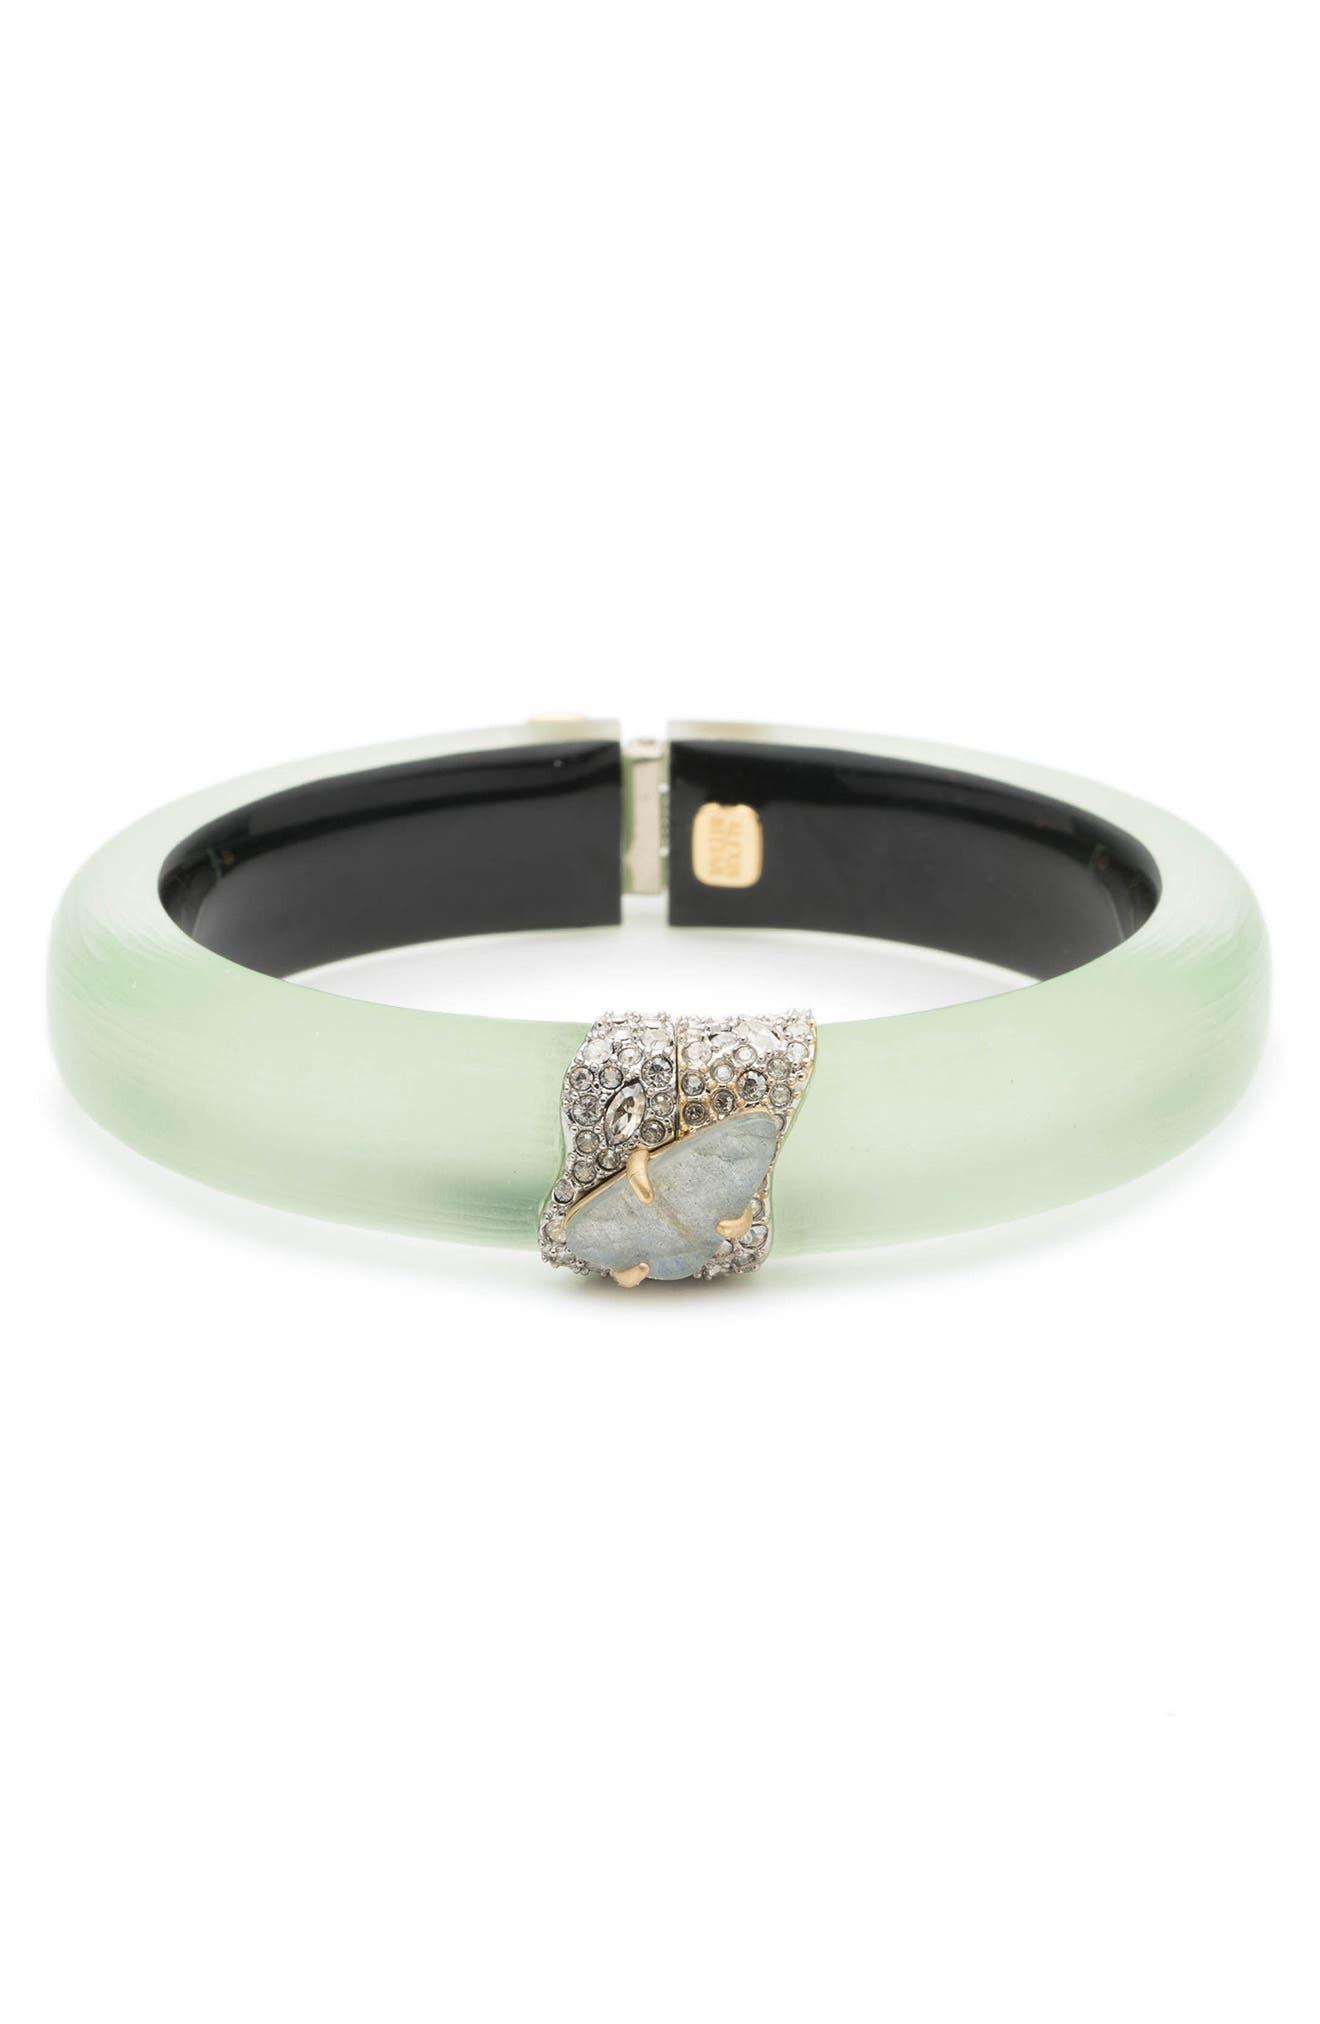 Crystal Encrusted Roxbury Bracelet,                         Main,                         color, Seafoam